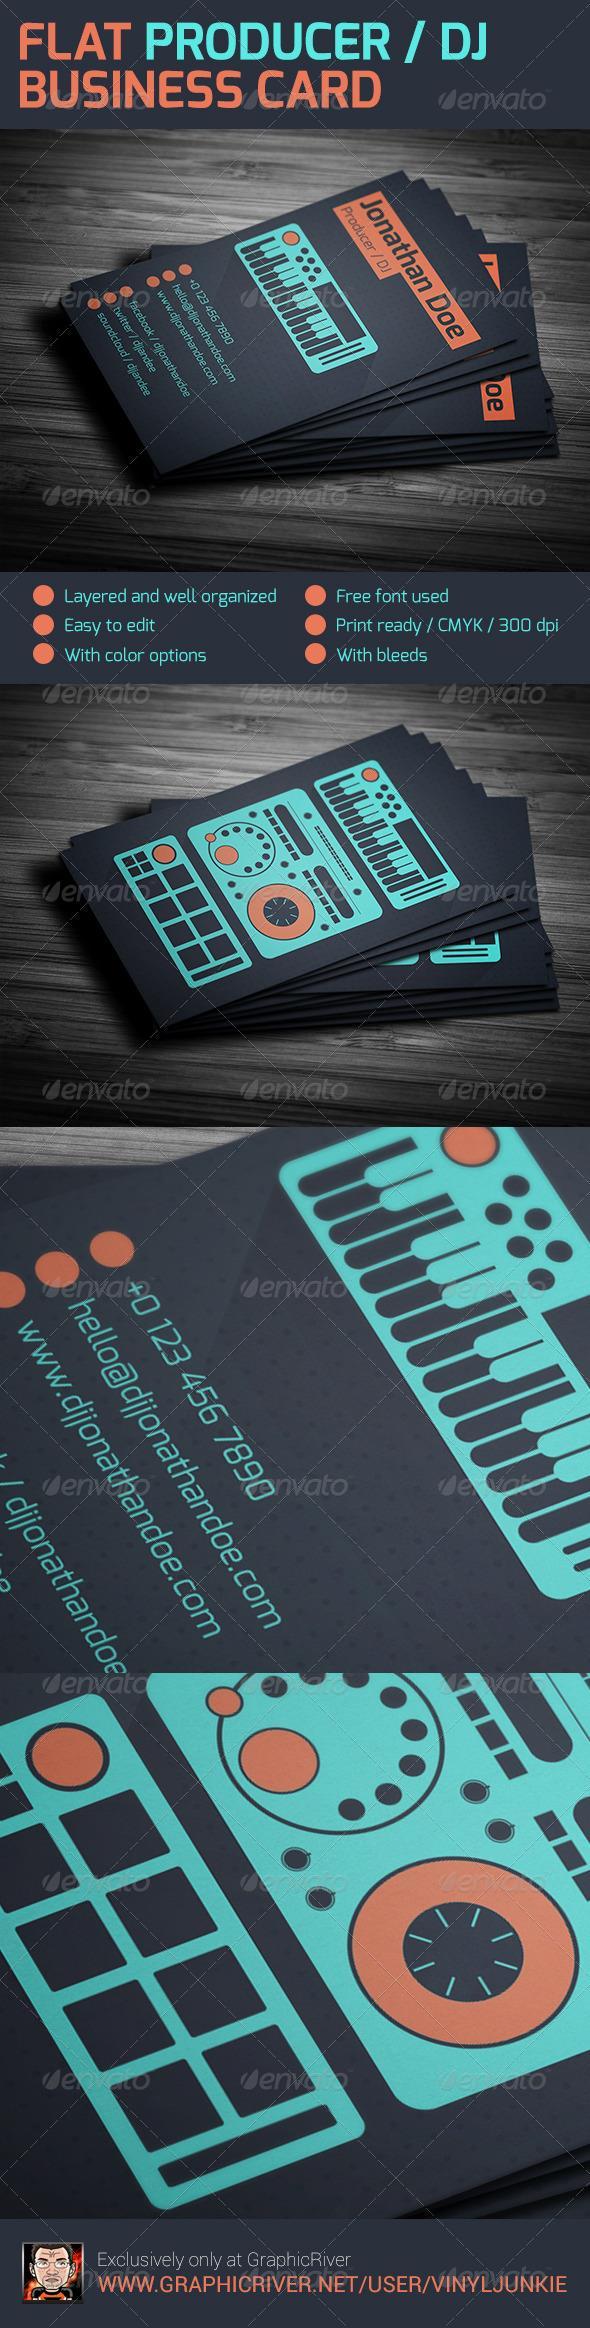 Flat Producer Dj Business Card Dj Business Cards Business Cards